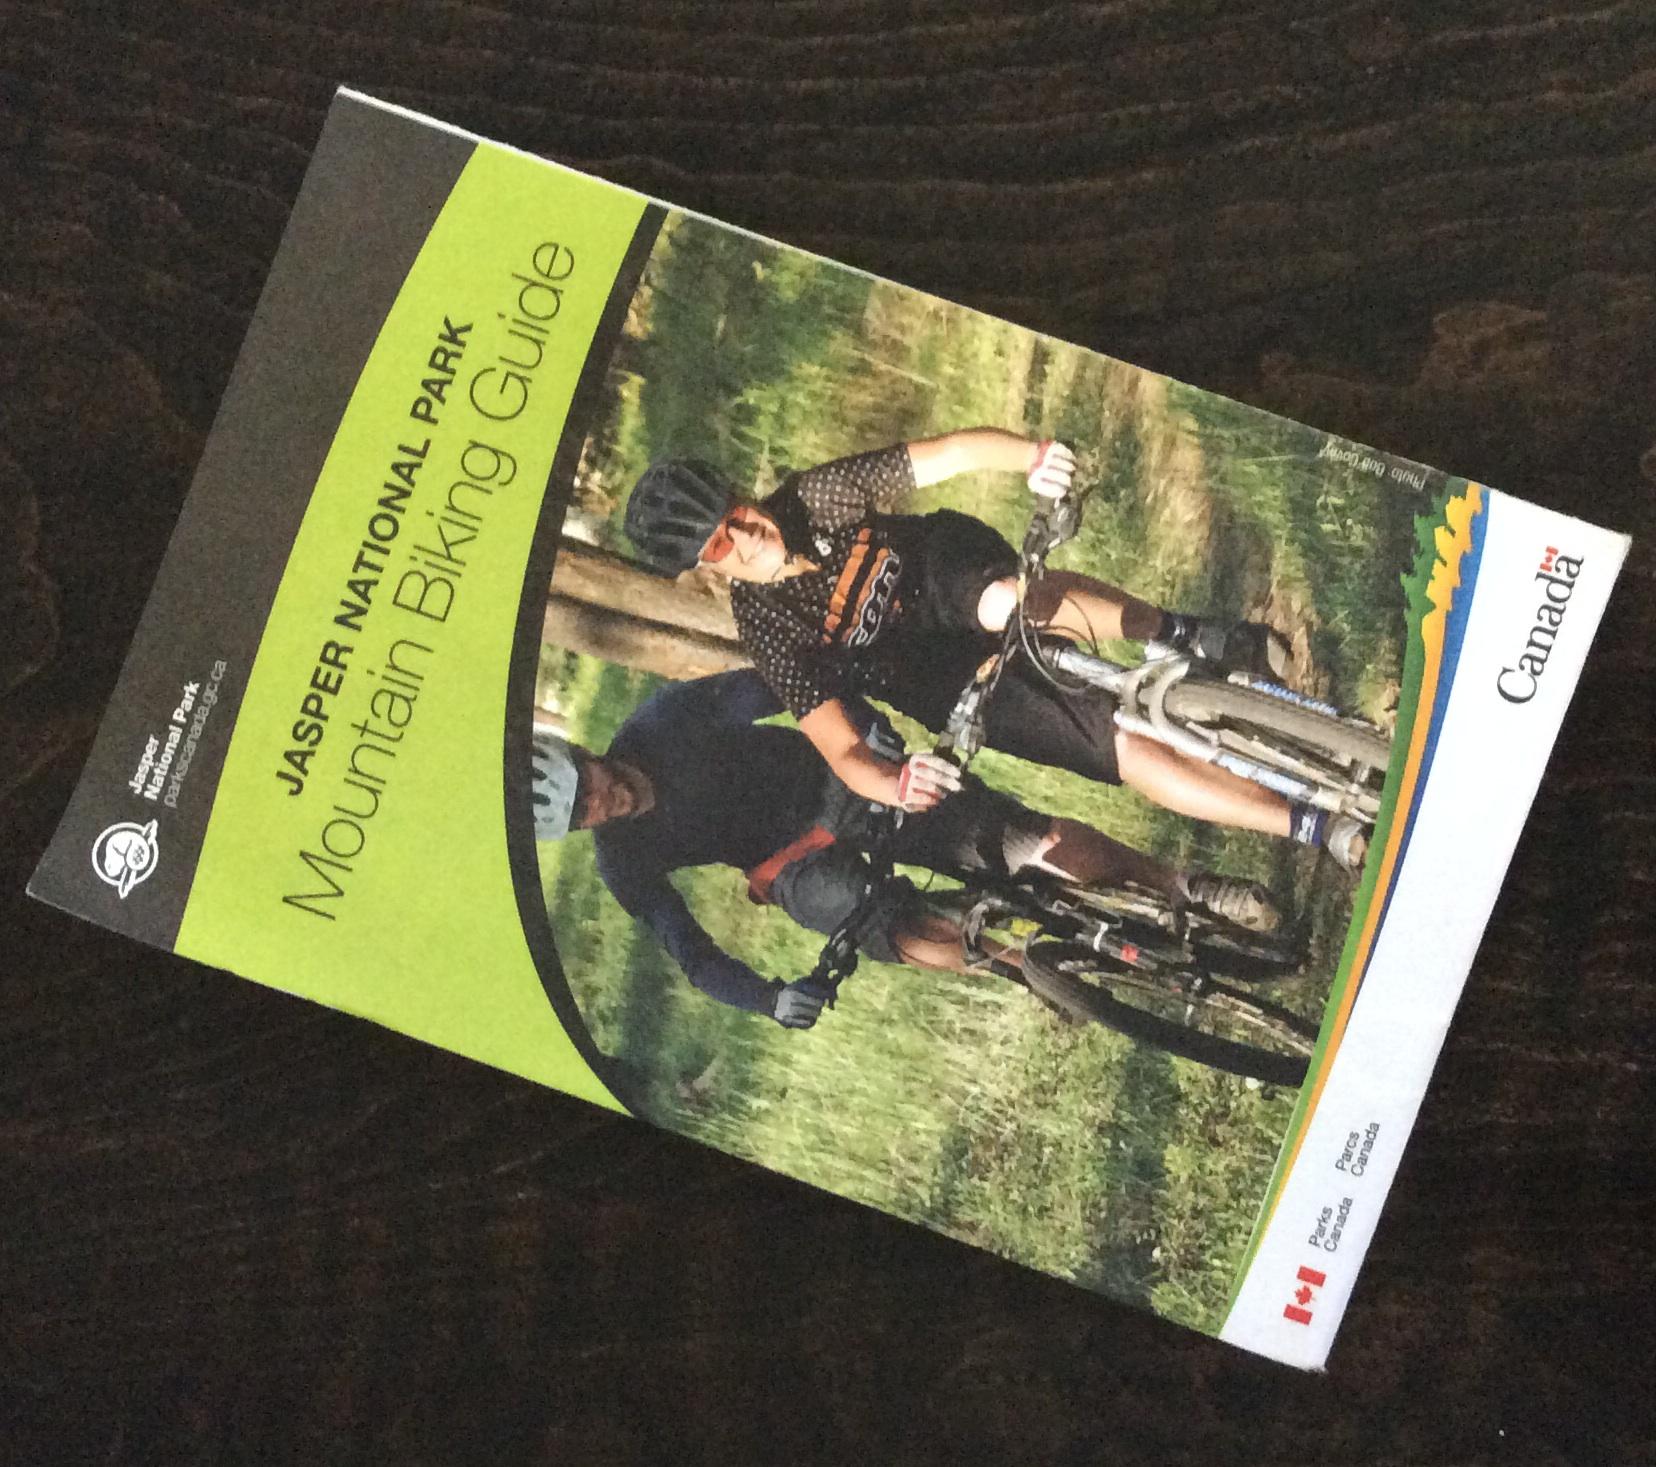 Free Jasper National Park MTB guide from Jasper Source for Sports